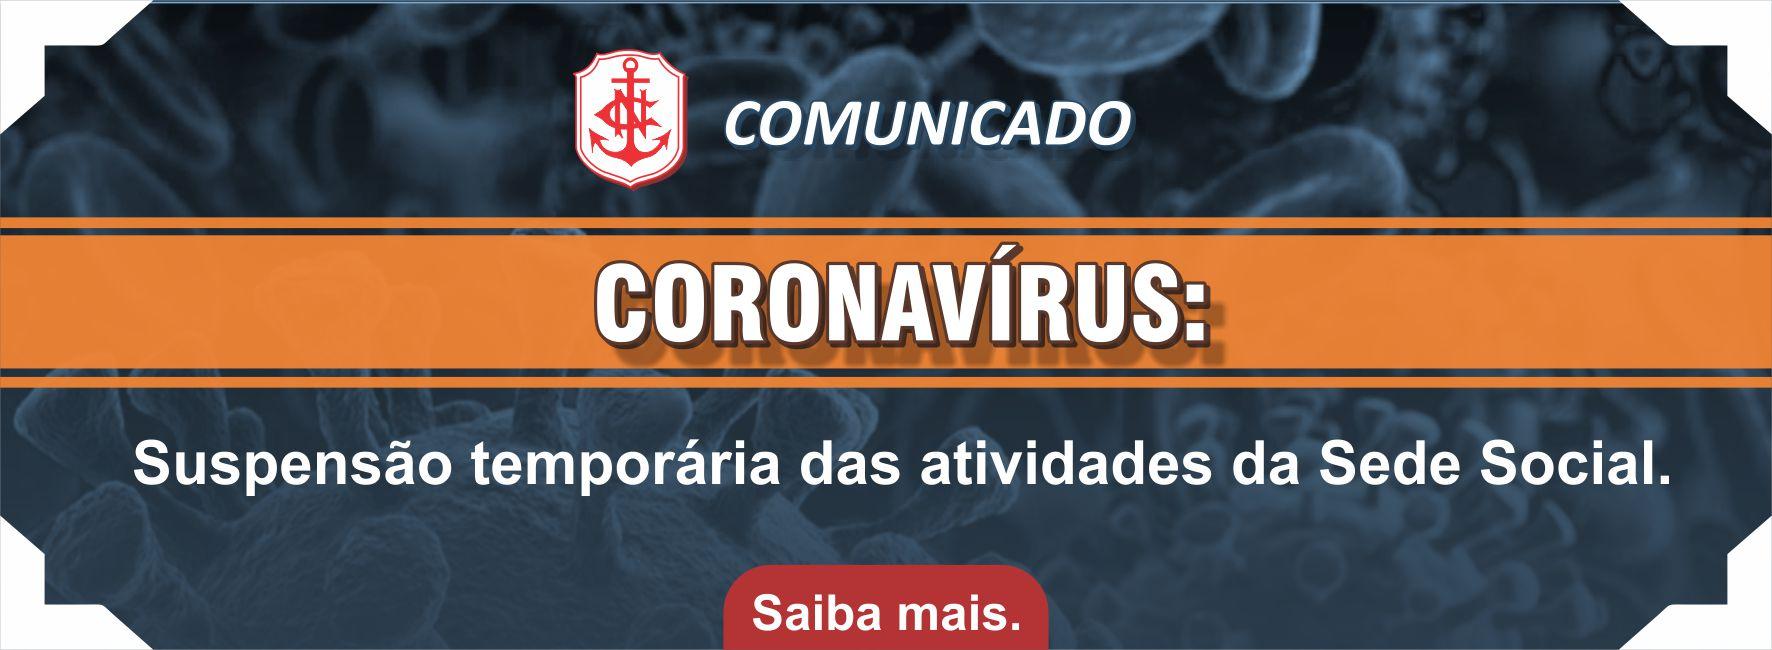 https://www.clubenaval.org.br/novo/?q=comunicado-coronav%C3%ADrus